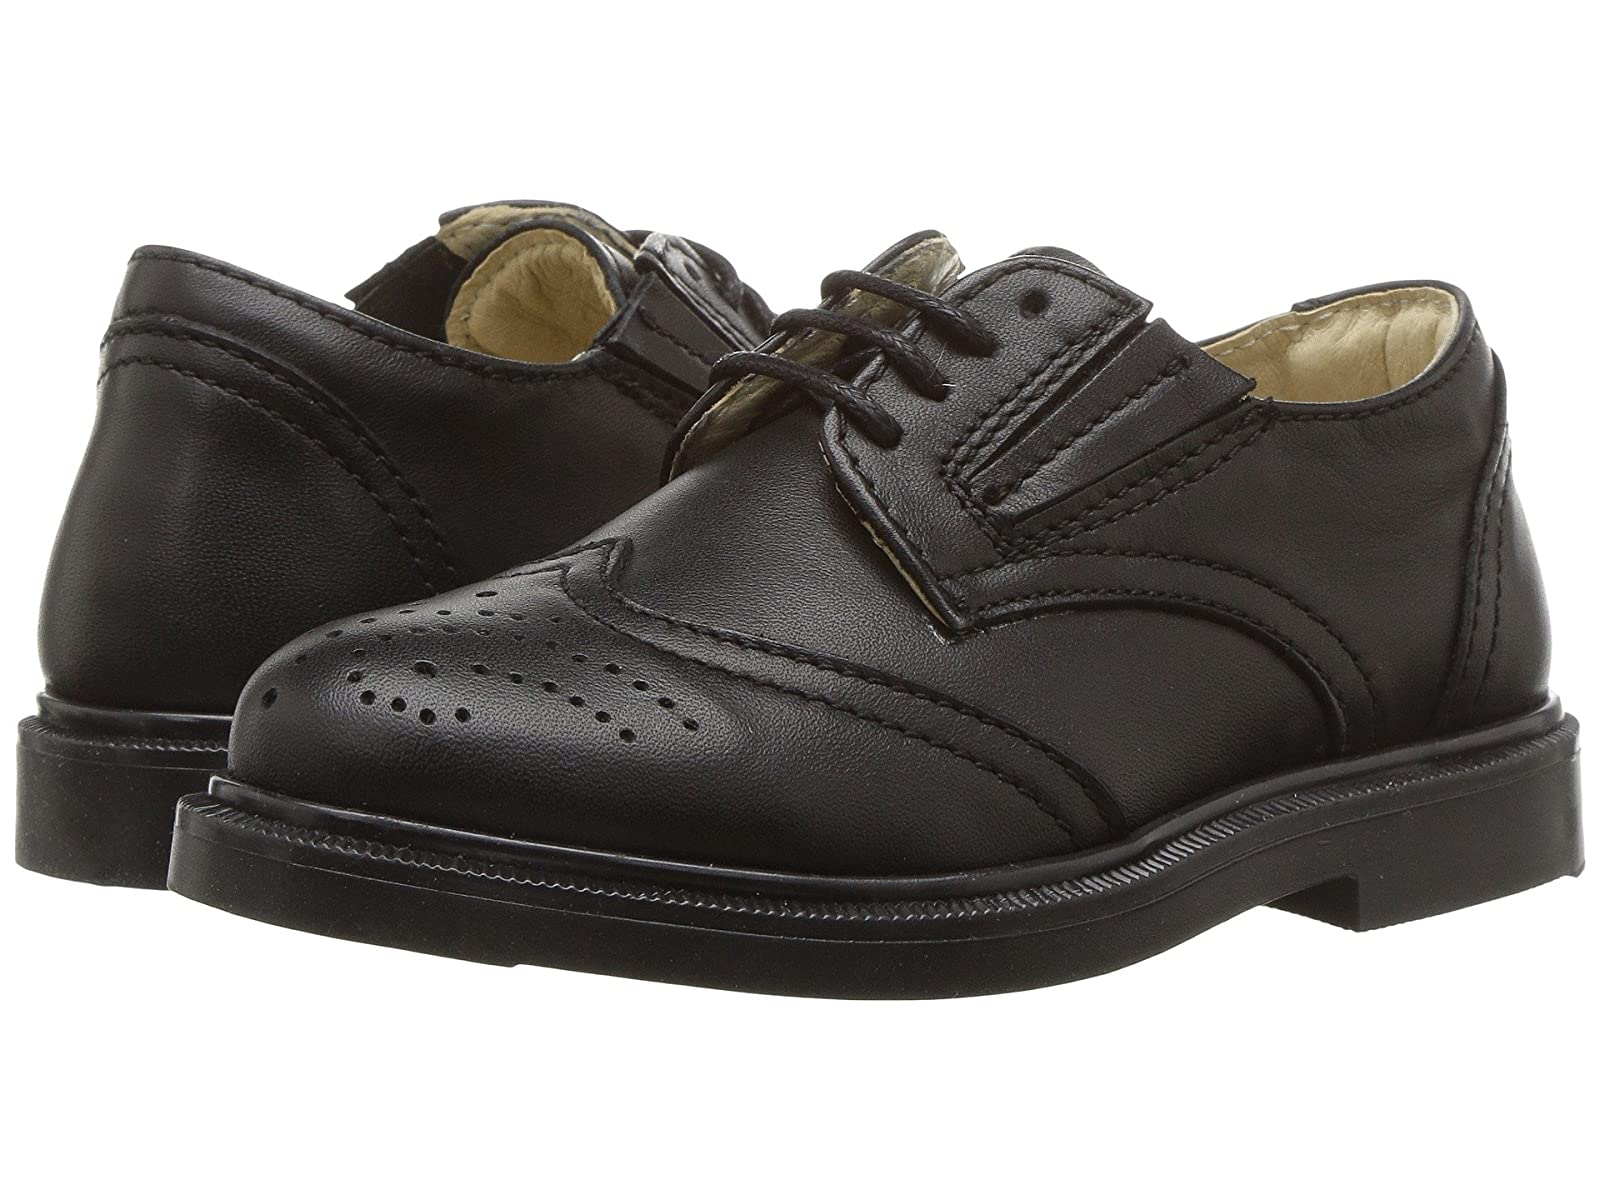 Primigi Kids POX 8242 (Little Kid)Cheap and distinctive eye-catching shoes